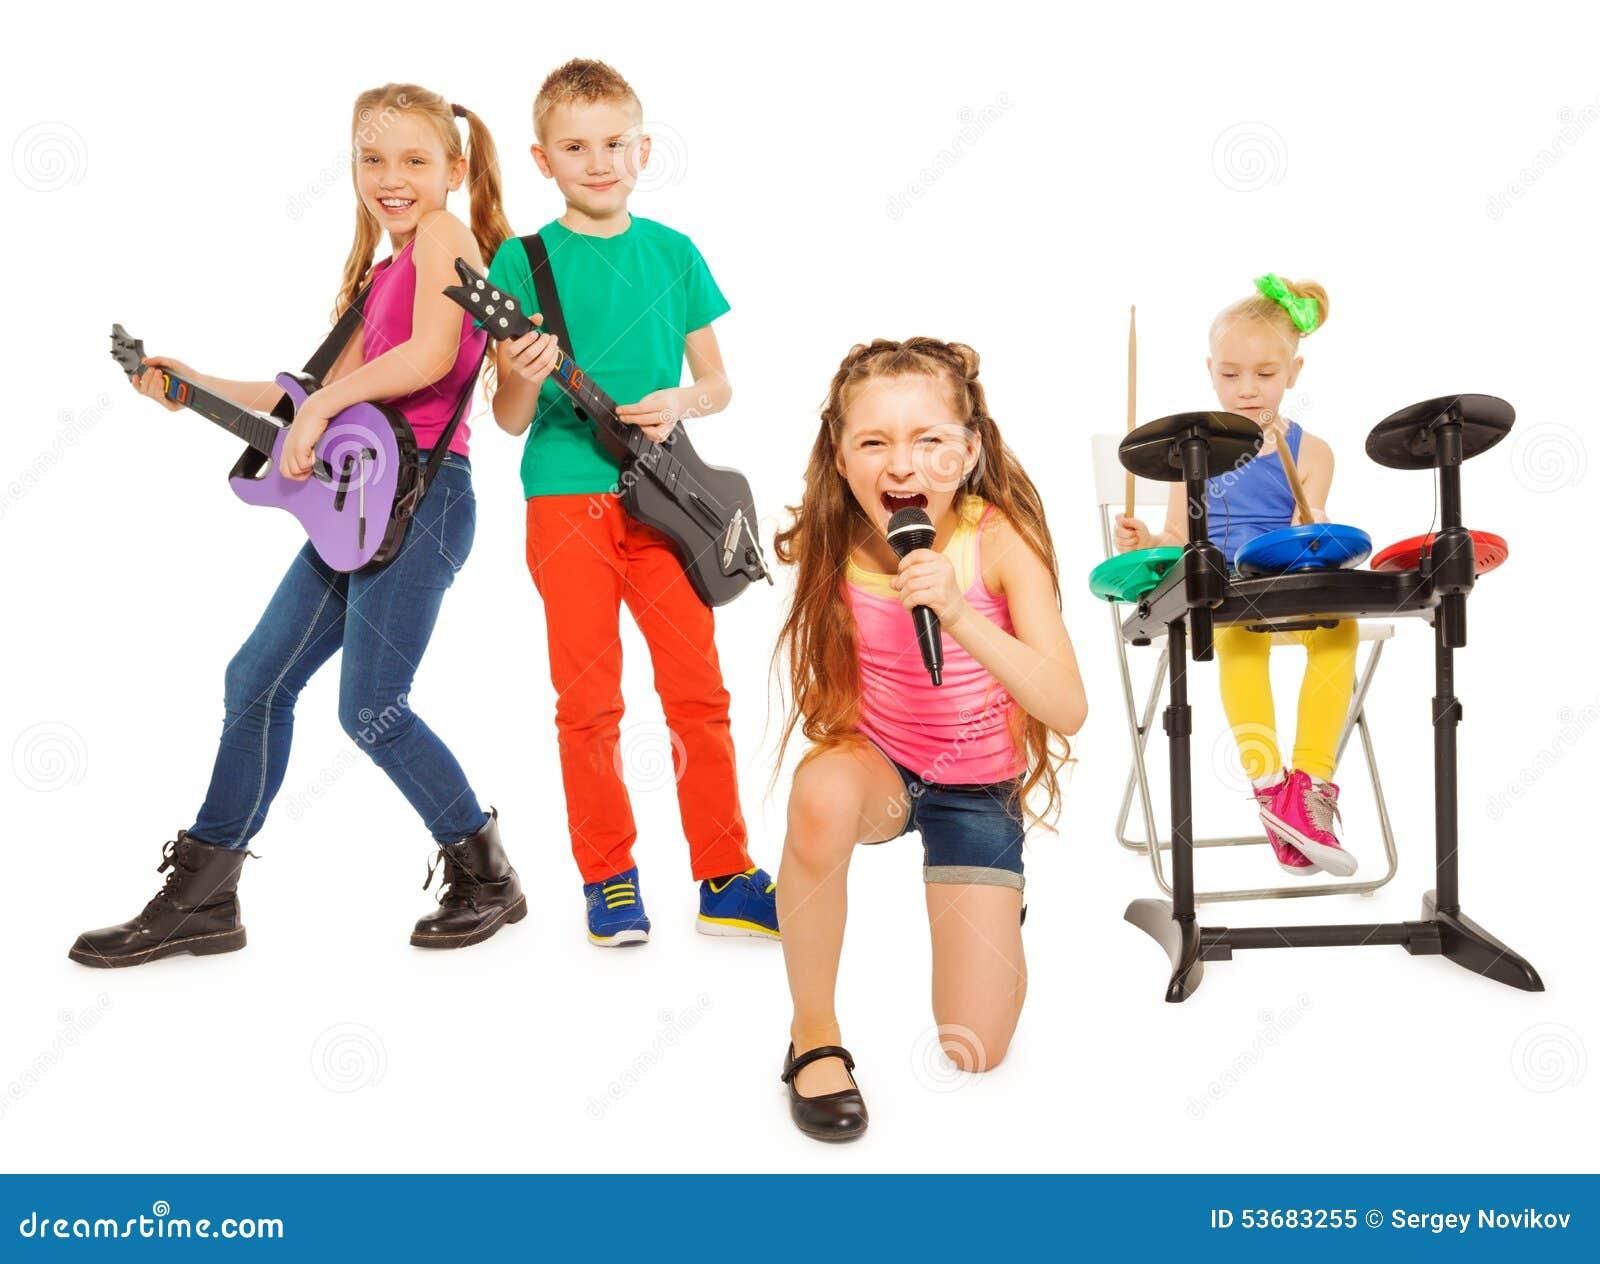 Band Kid Rock